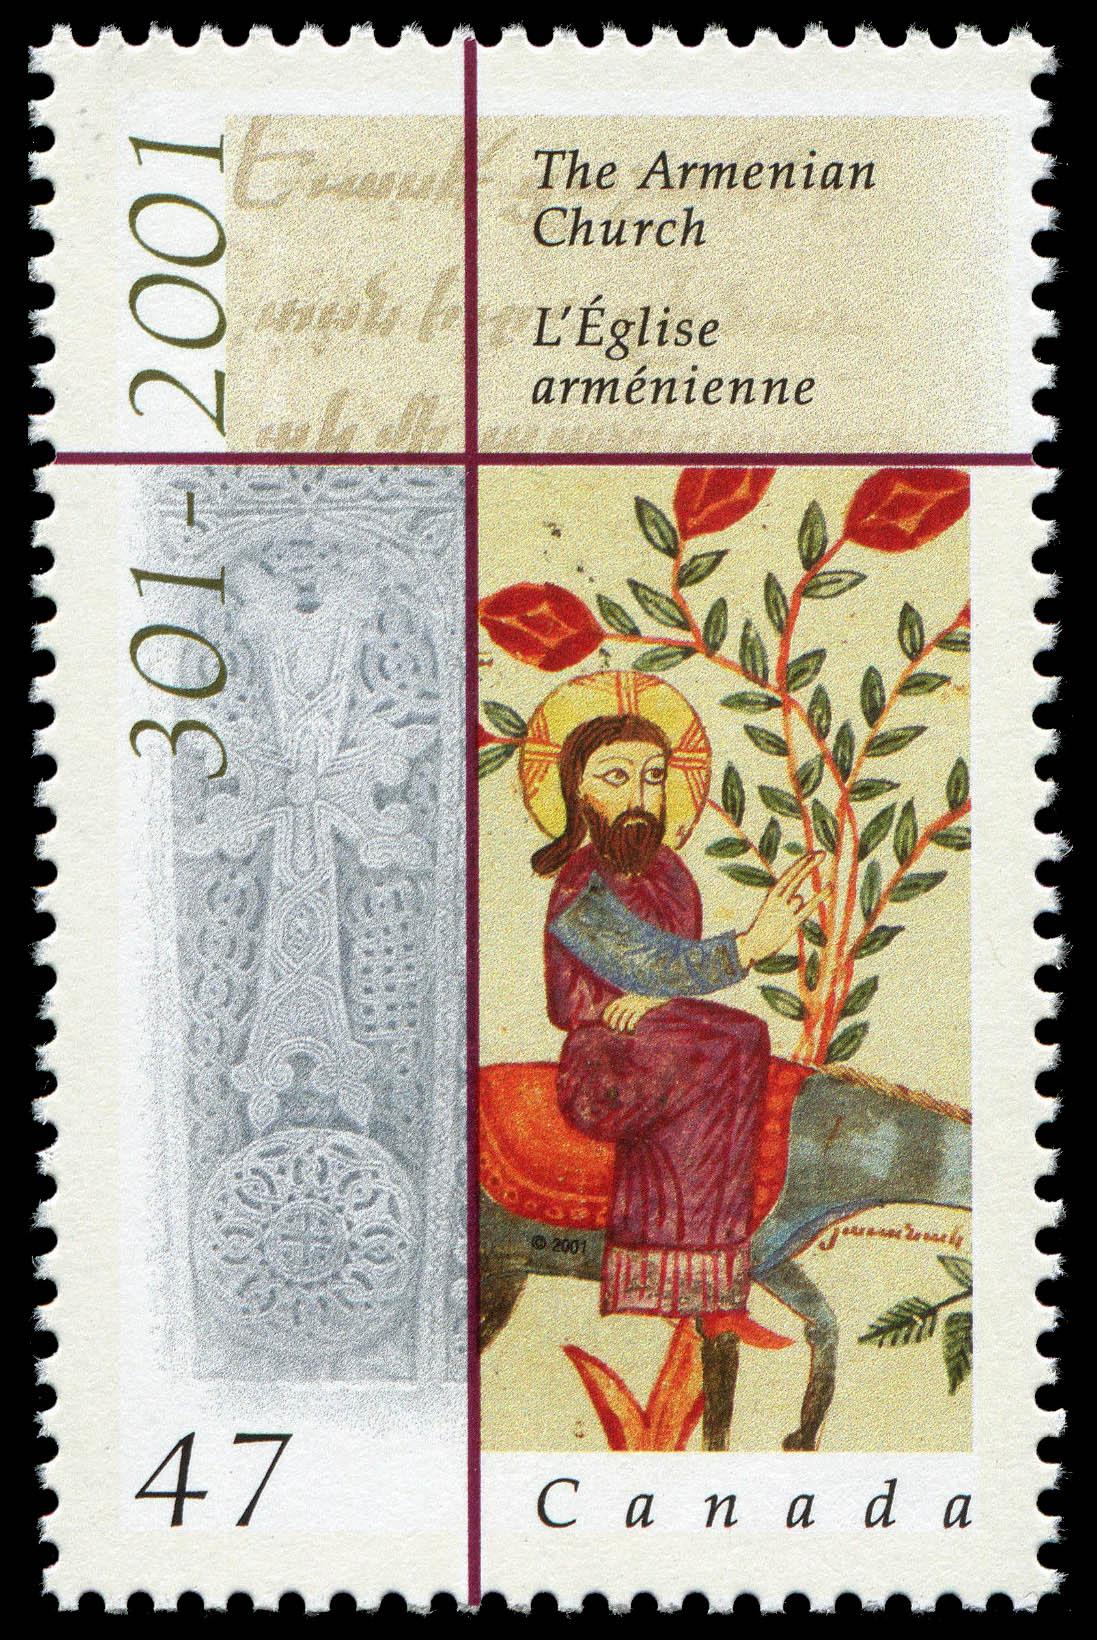 The Armenian Church, 301-2001 Canada Postage Stamp